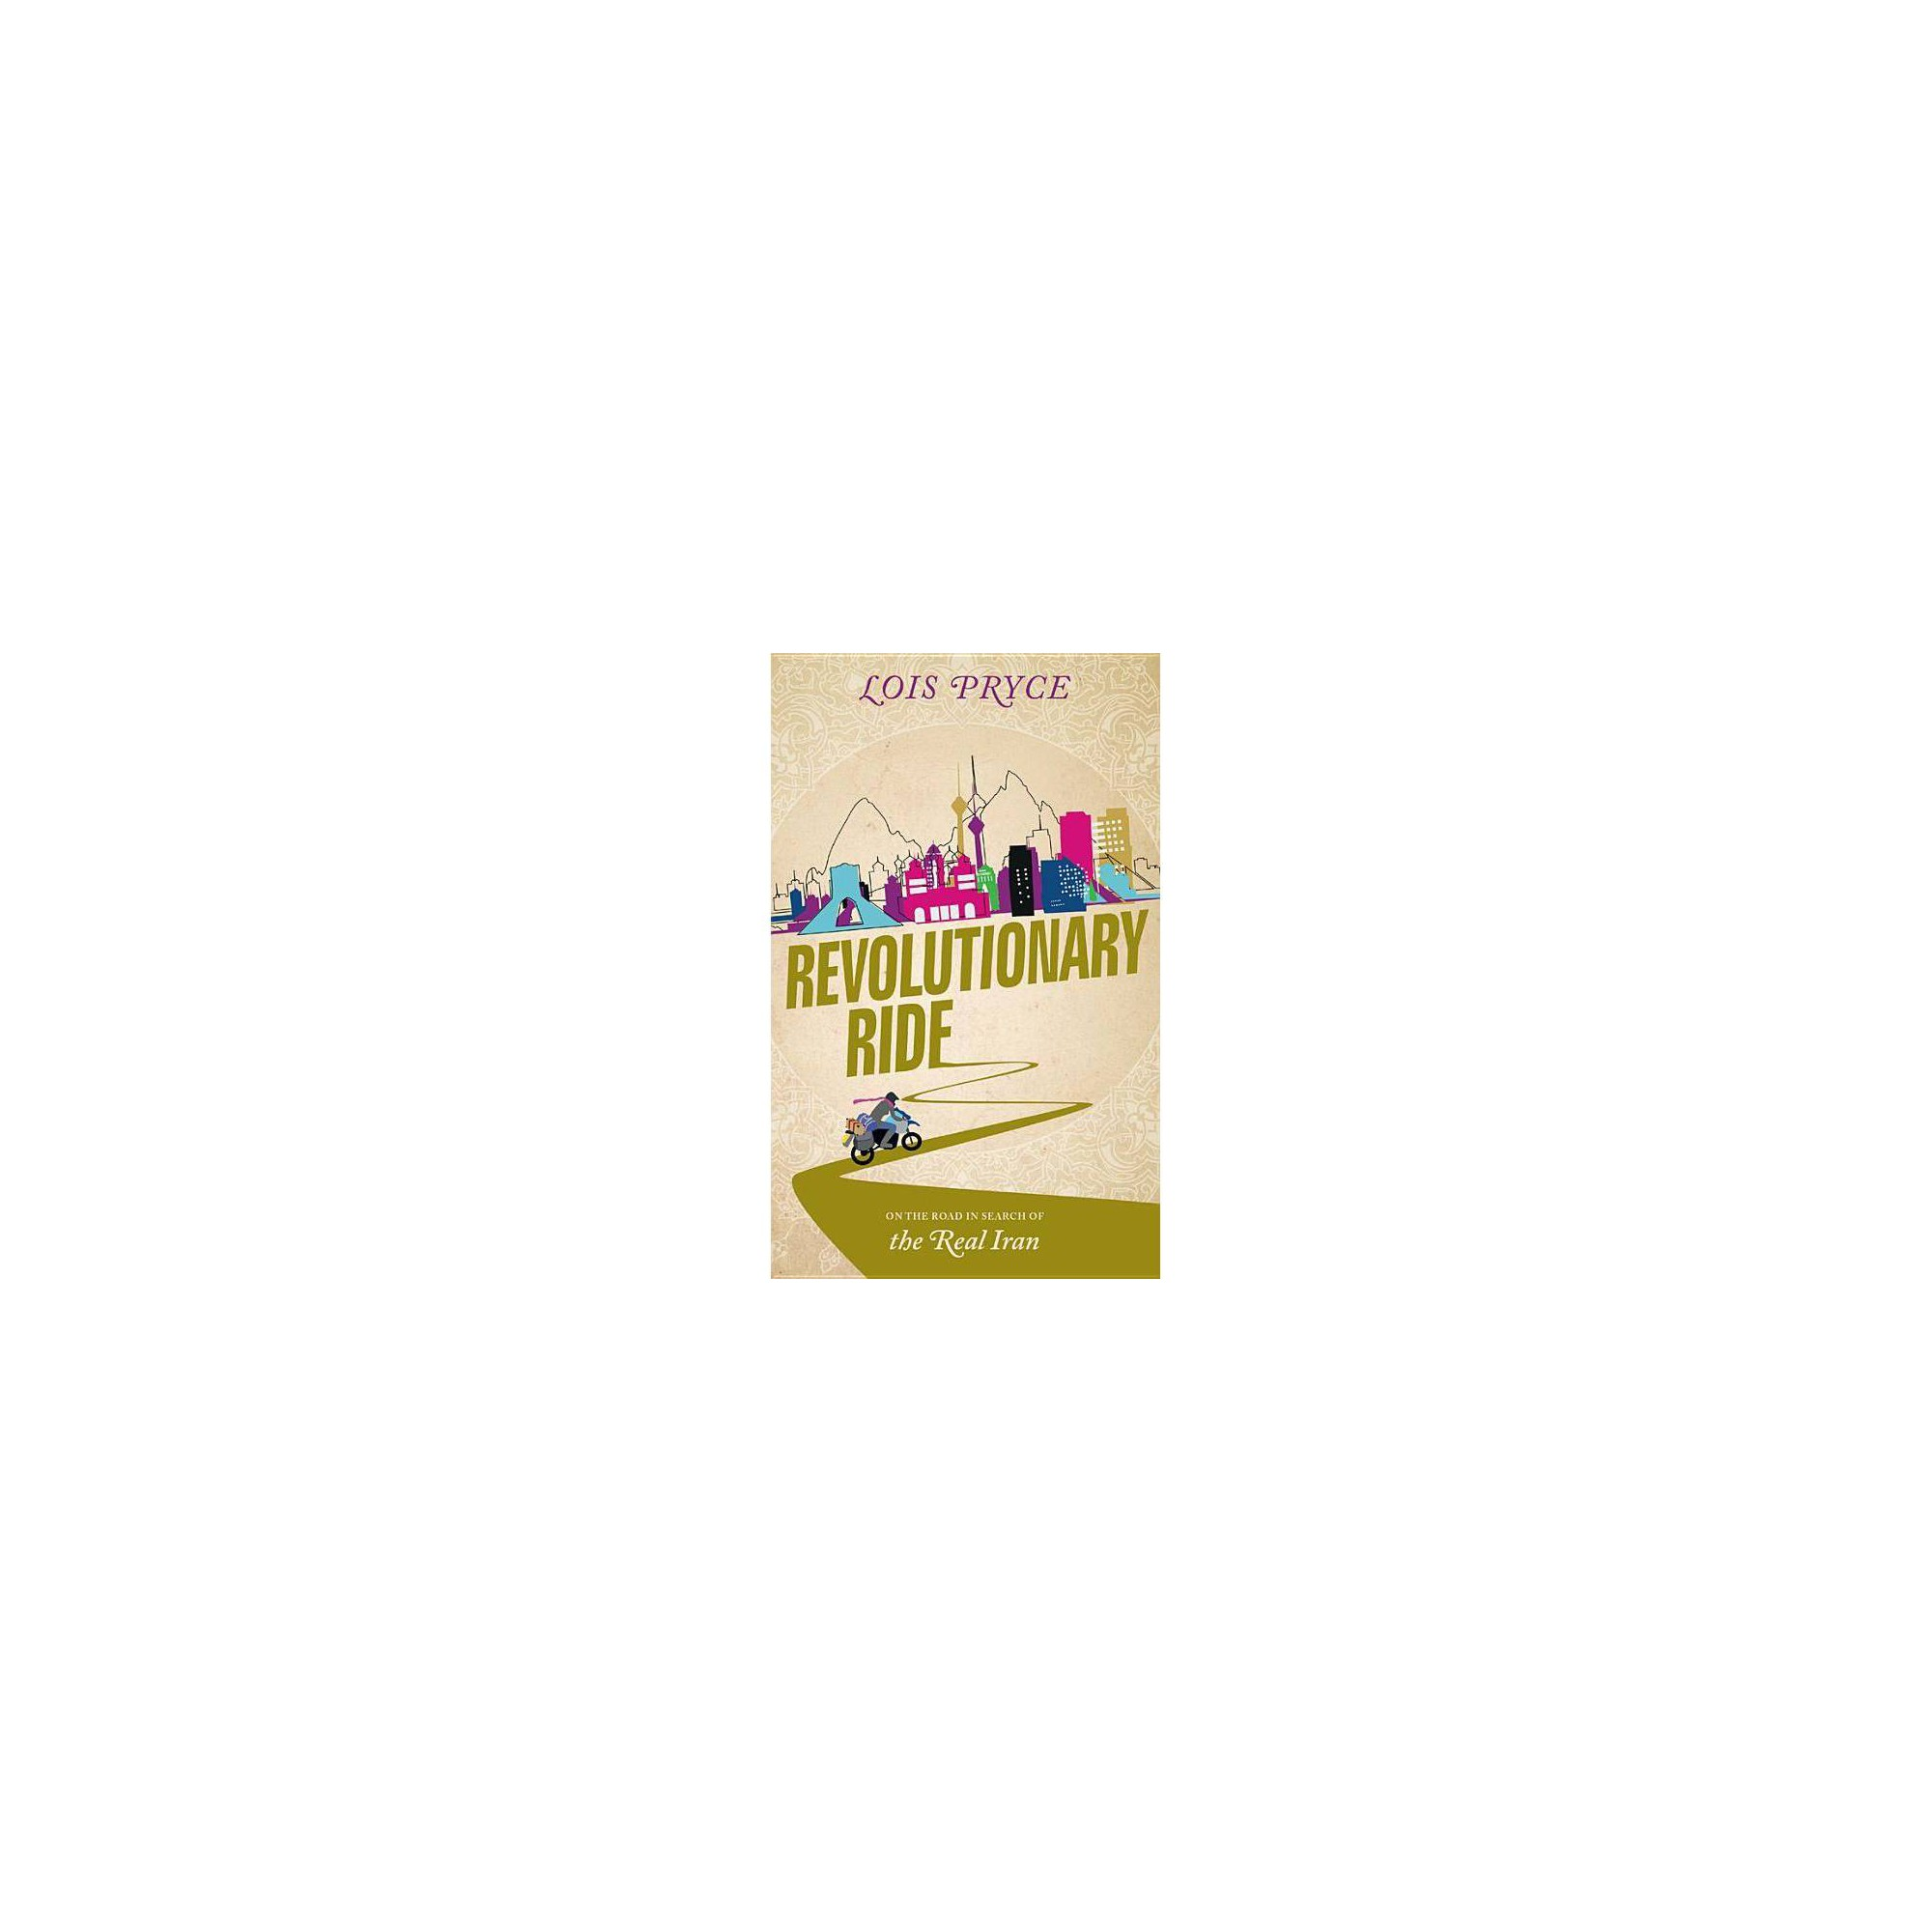 Revolutionary Ride - by Lois Pryce (Paperback)